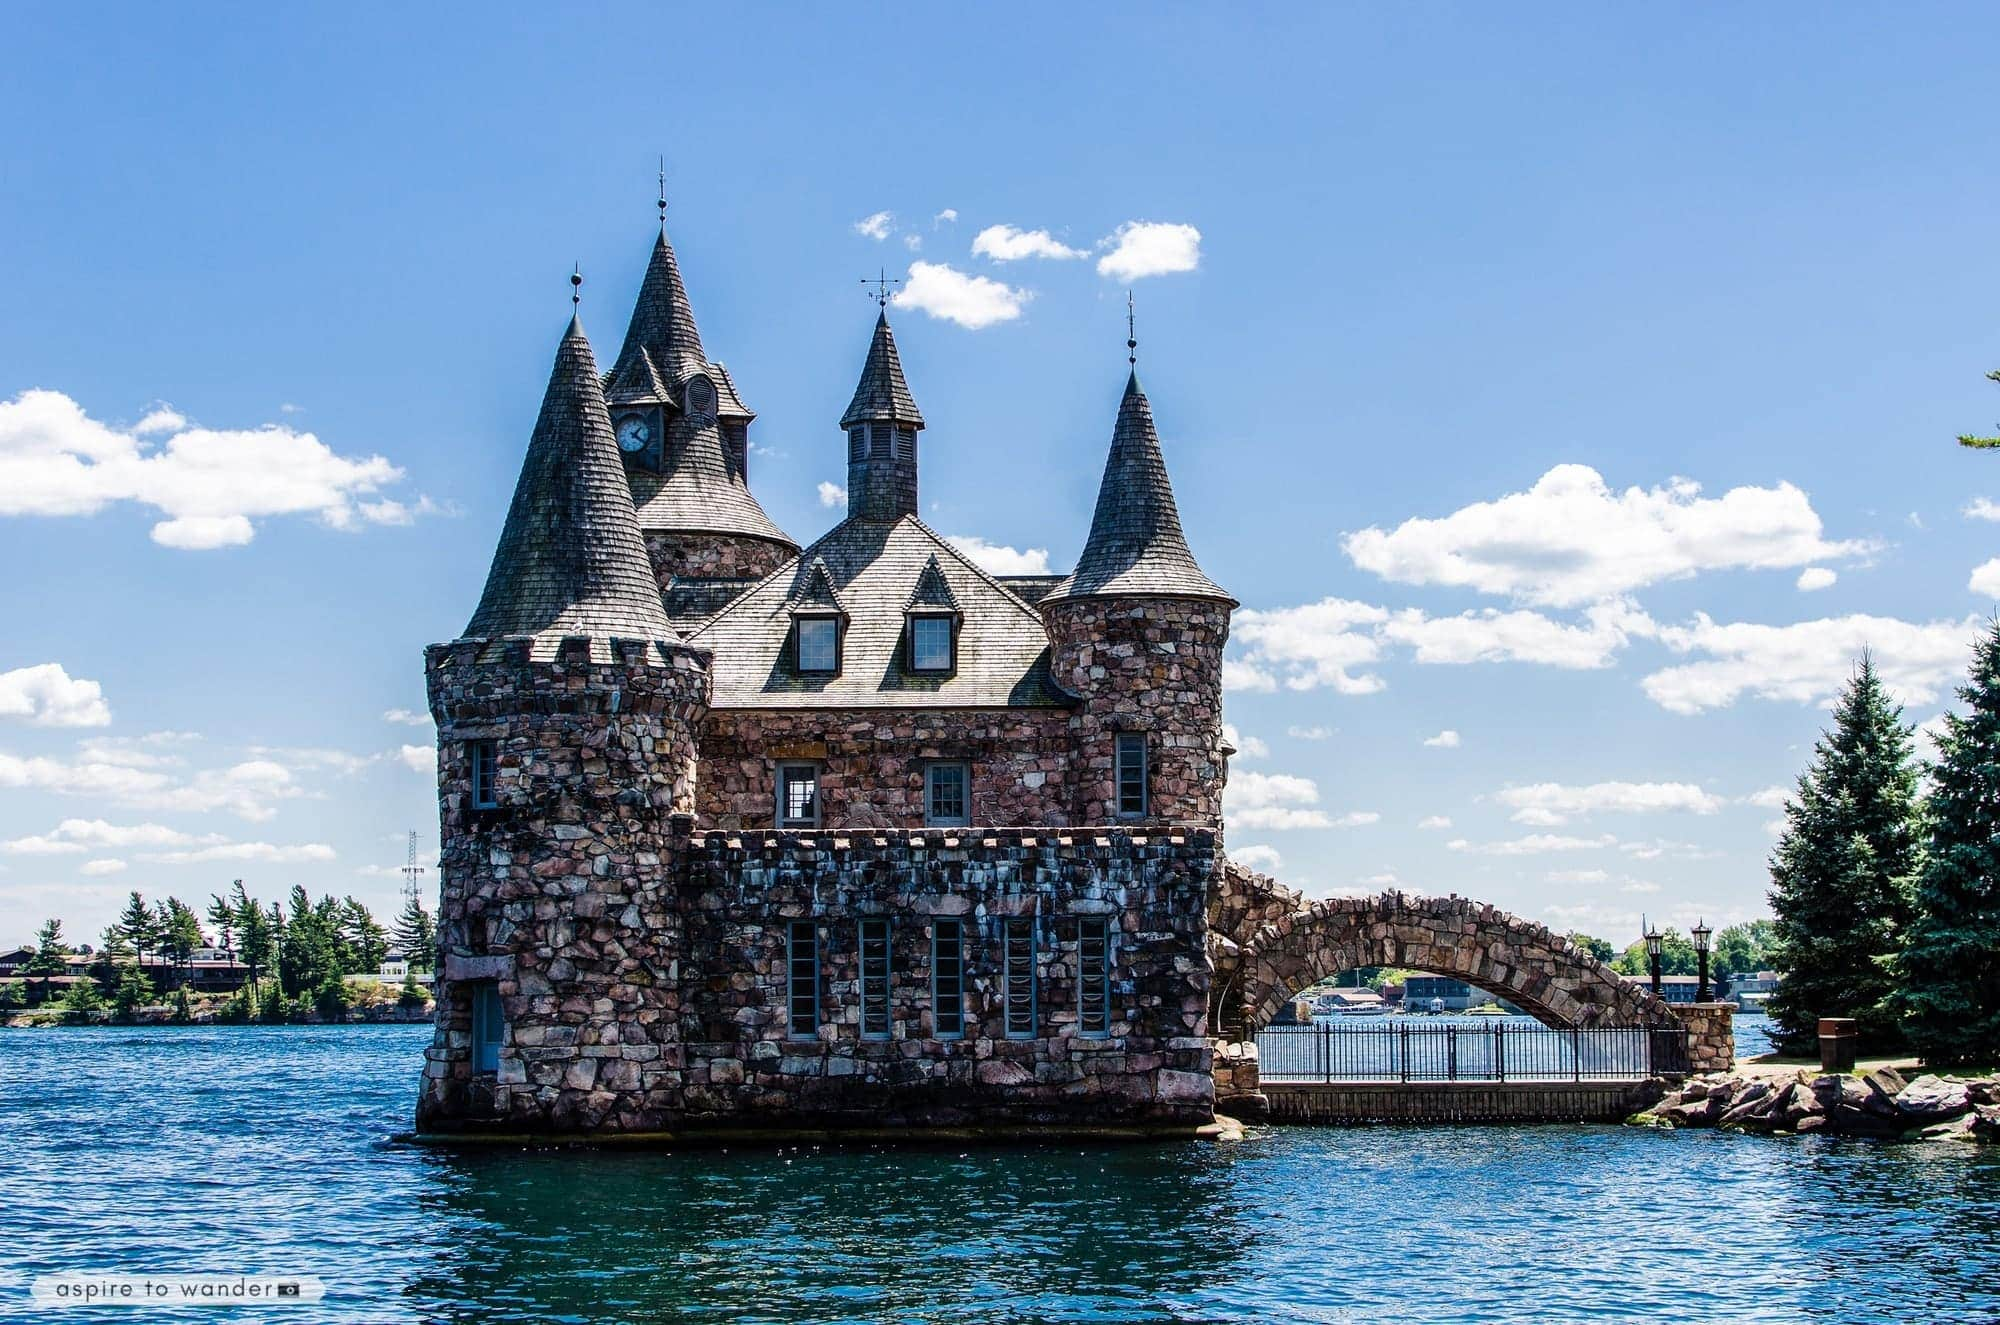 Boldt Castle - The Thousand Islands